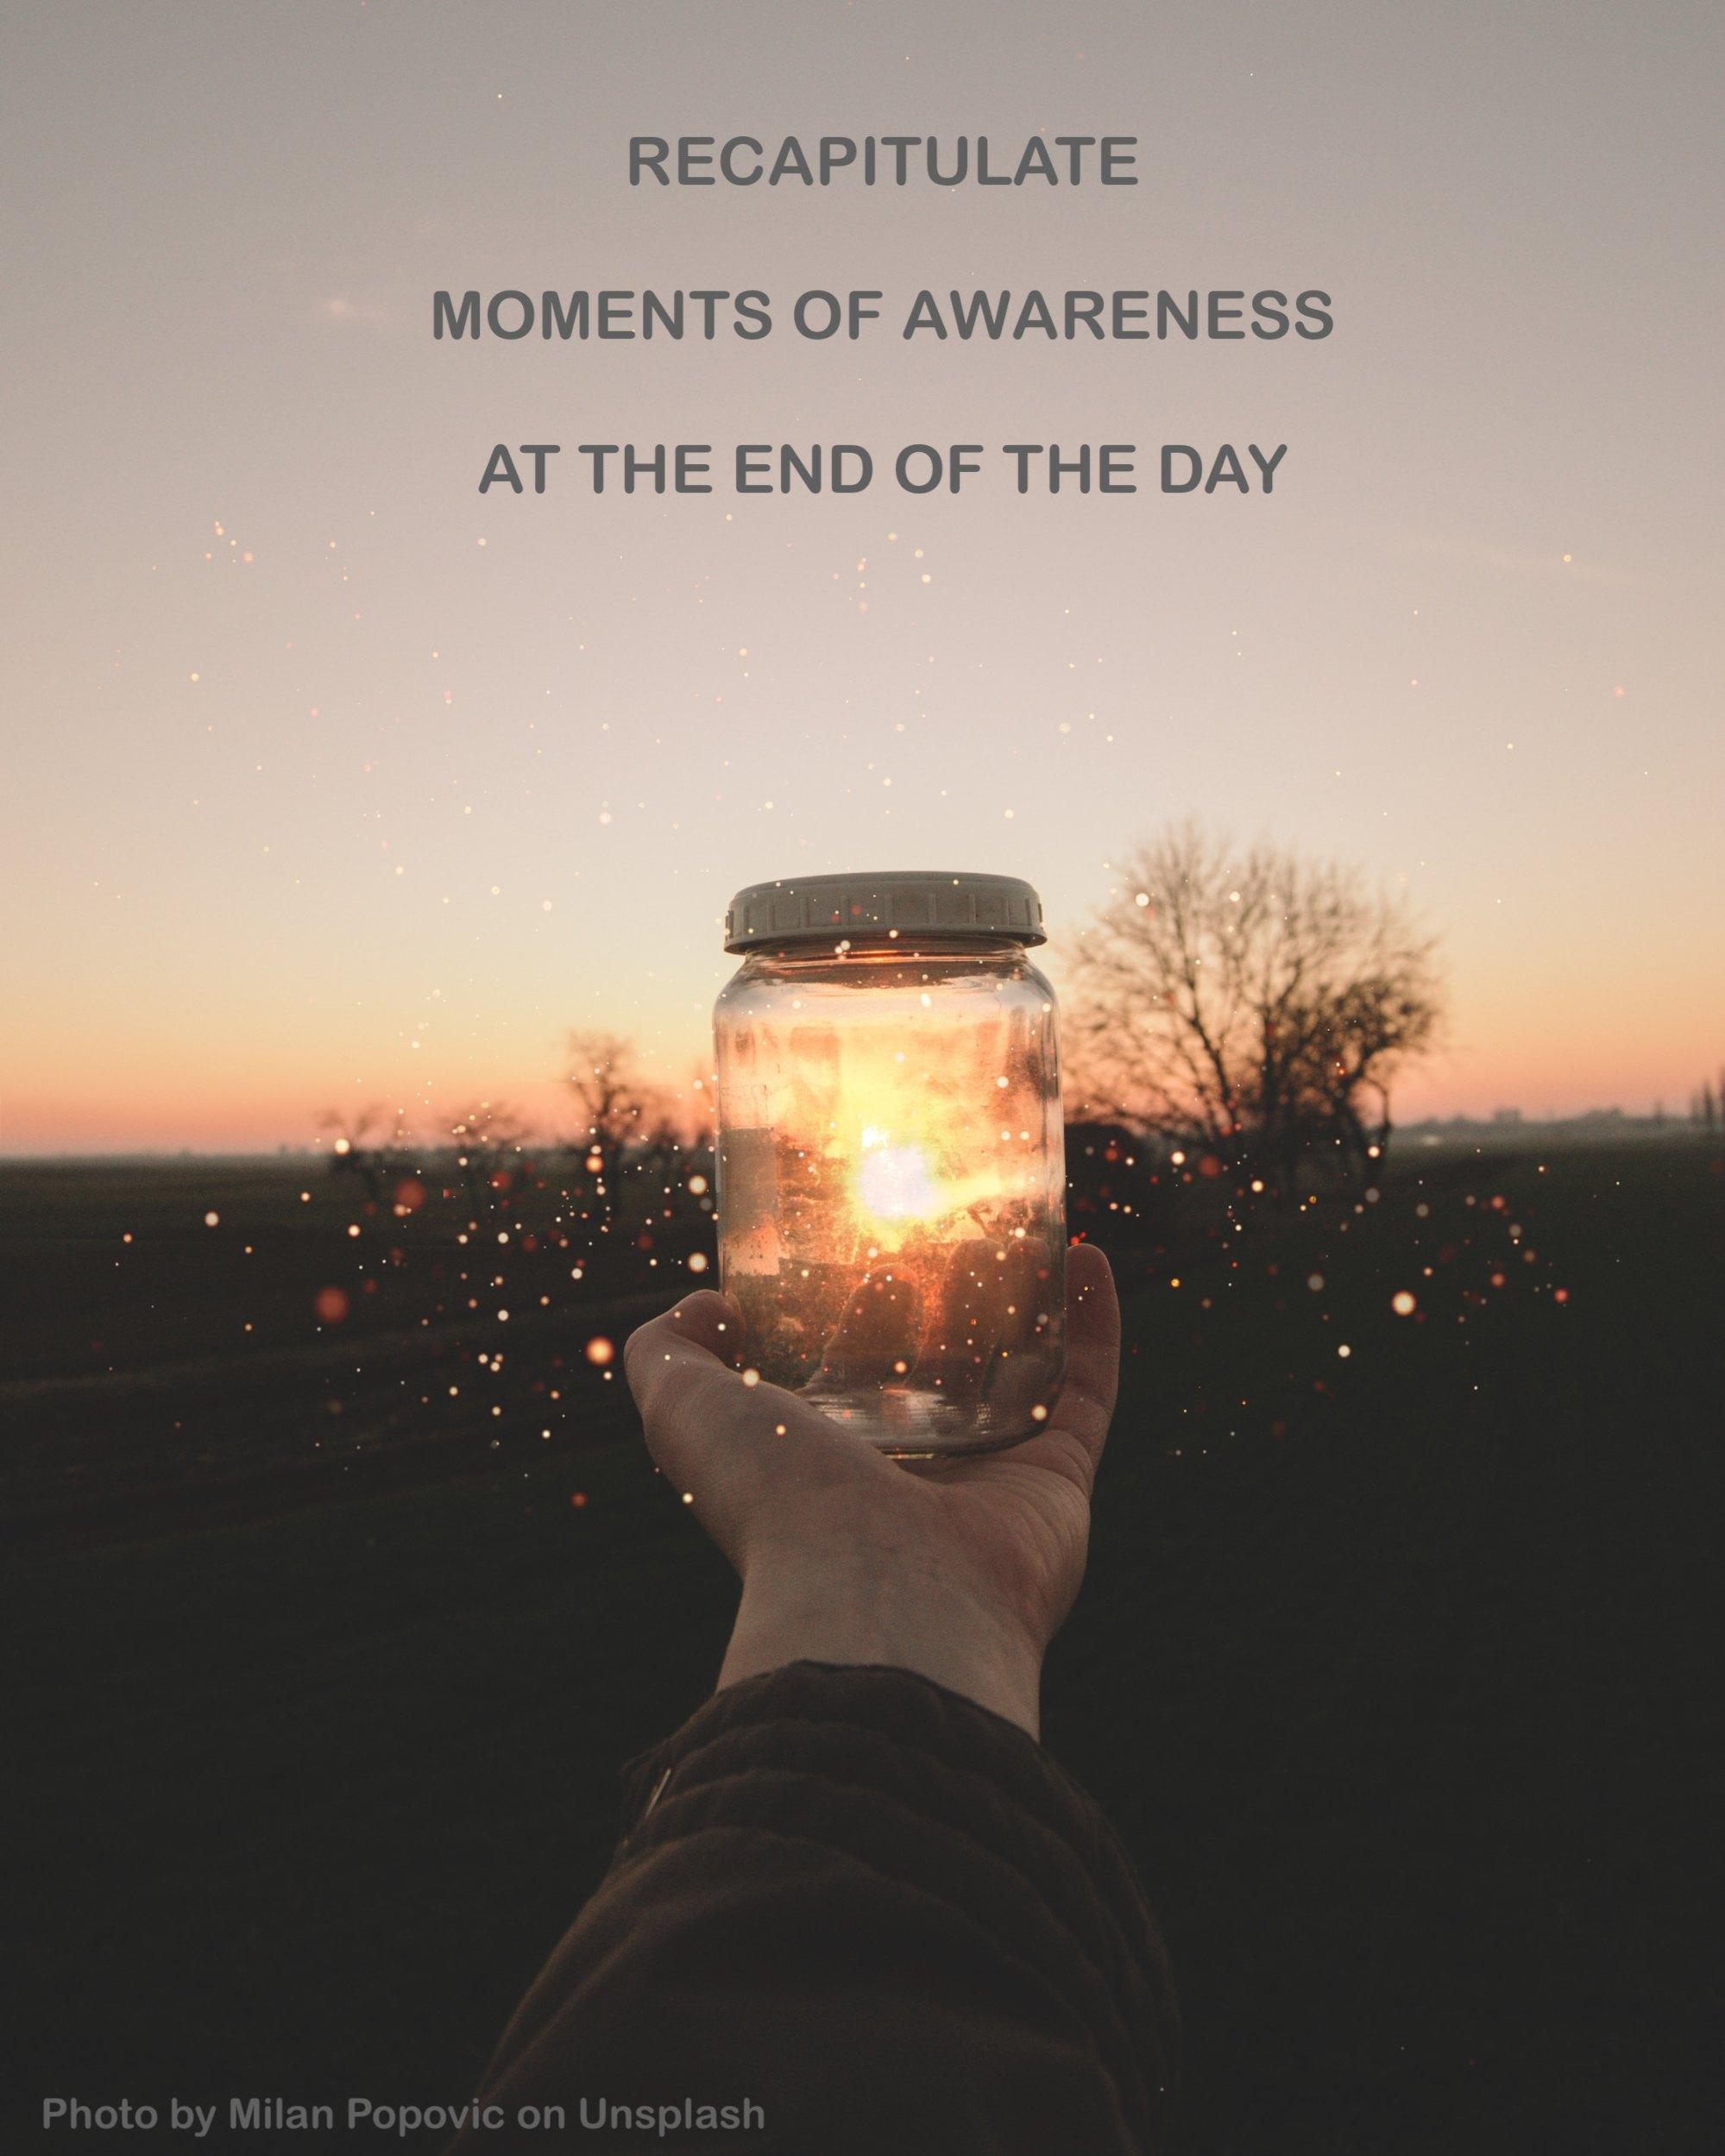 PAGE OF CUPS, tarot, mayan, daykeeper, Kib, solitude, balance, interdependent, healingthroughceremony.com, michele fire-riverheart